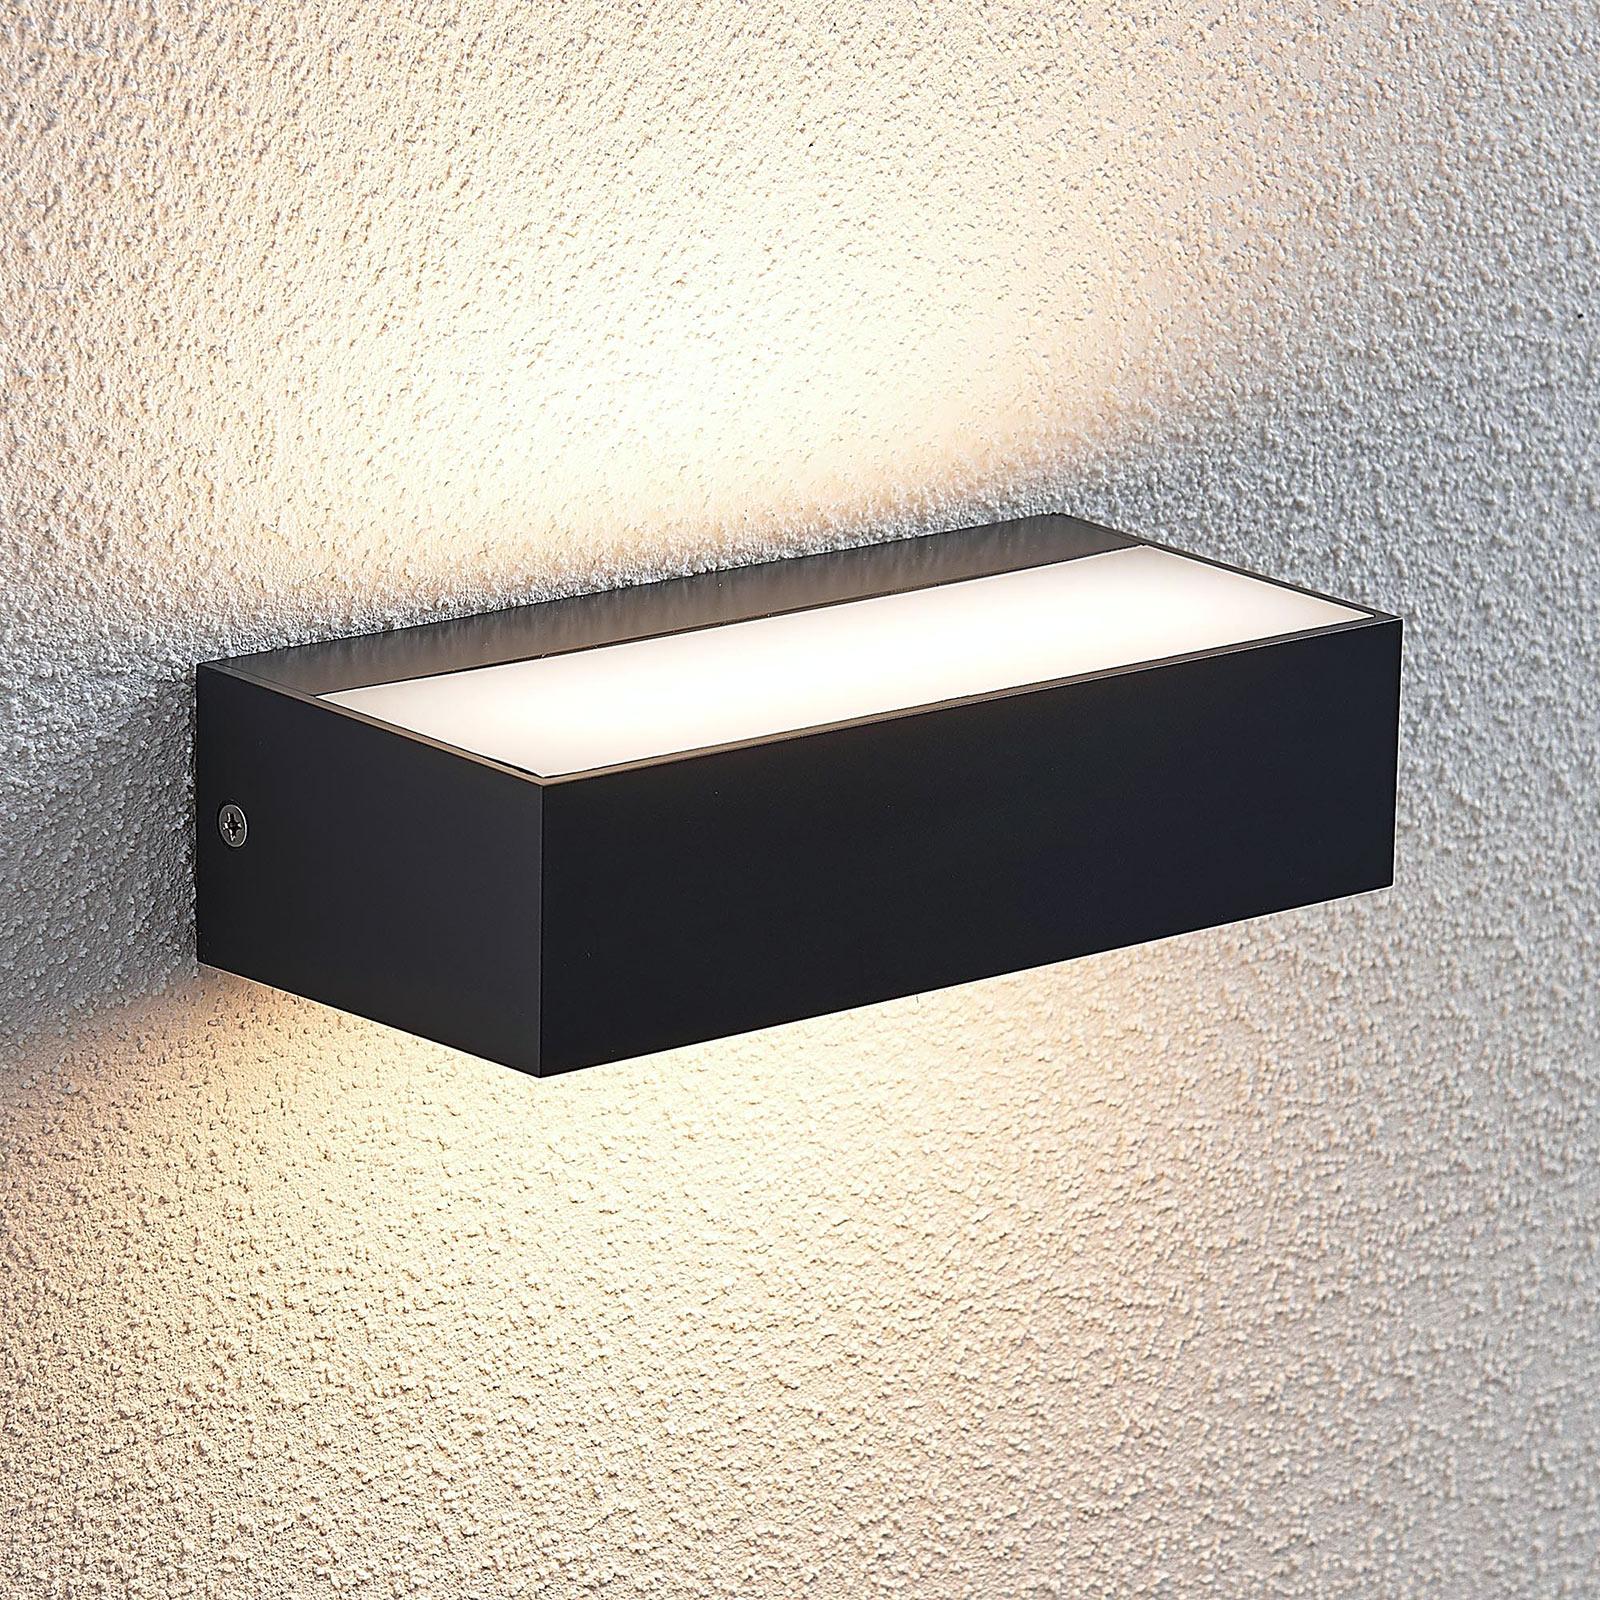 LED-ulkoseinävalaisin Nienke, IP65, 17 cm